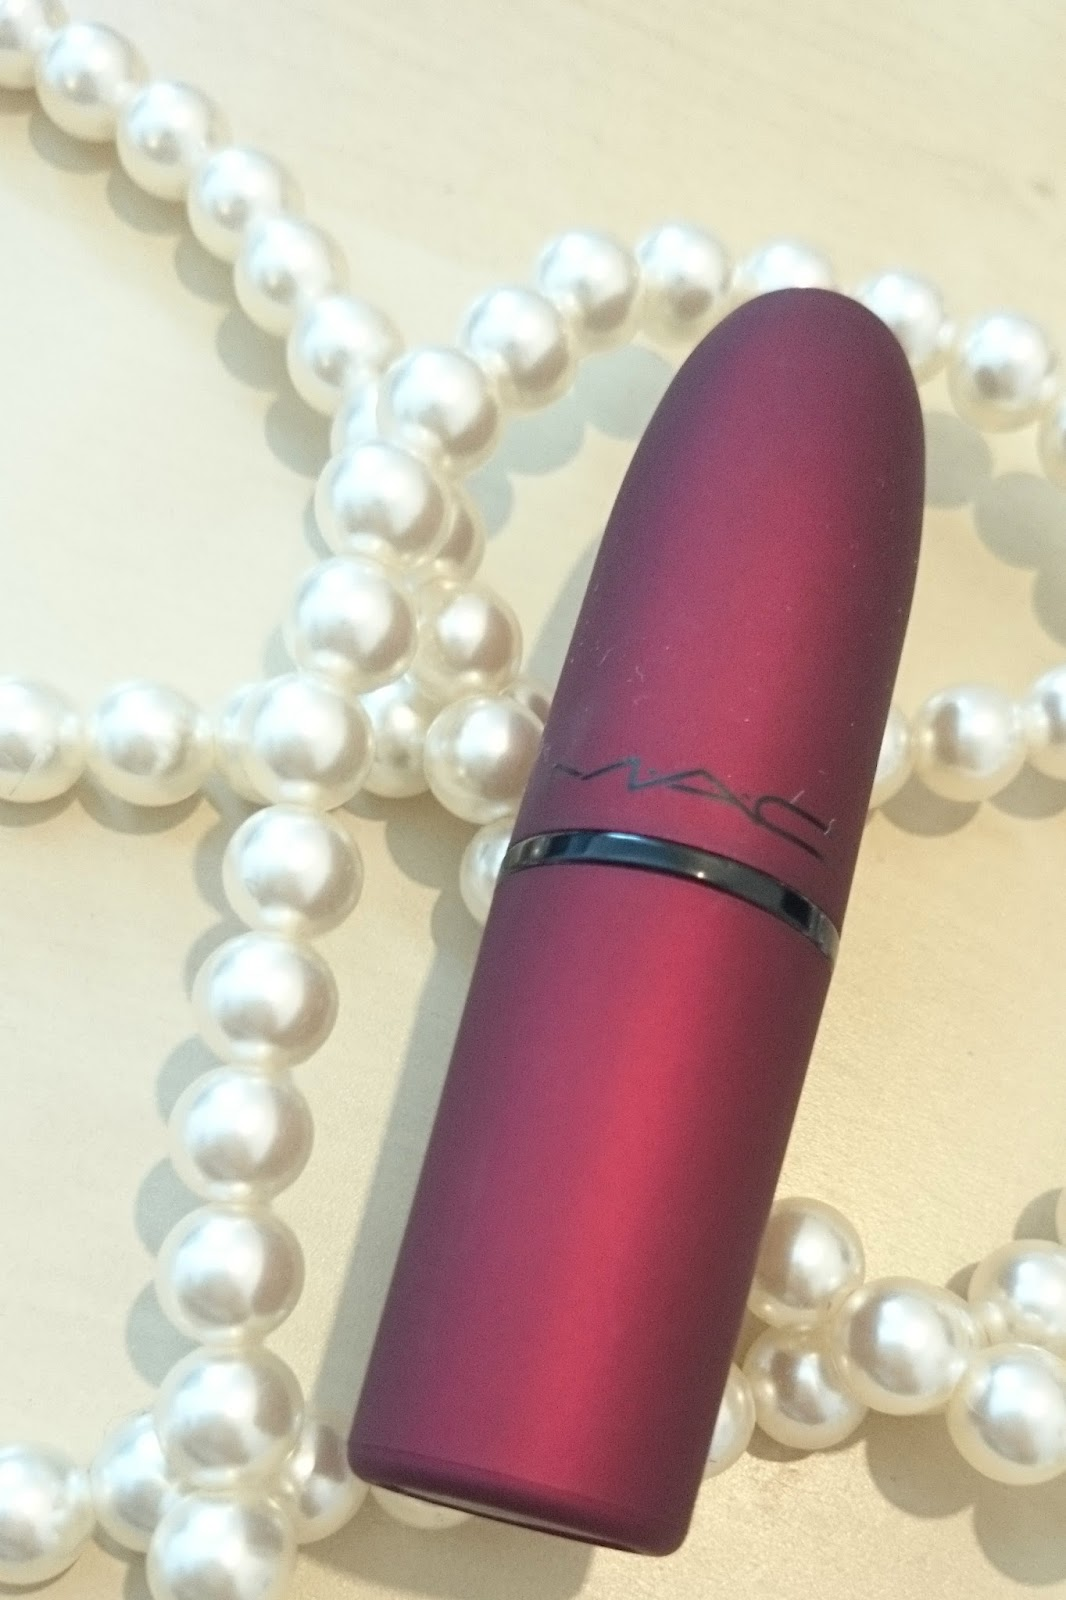 Mac Frost Lipstick Viva Glam Rihanna